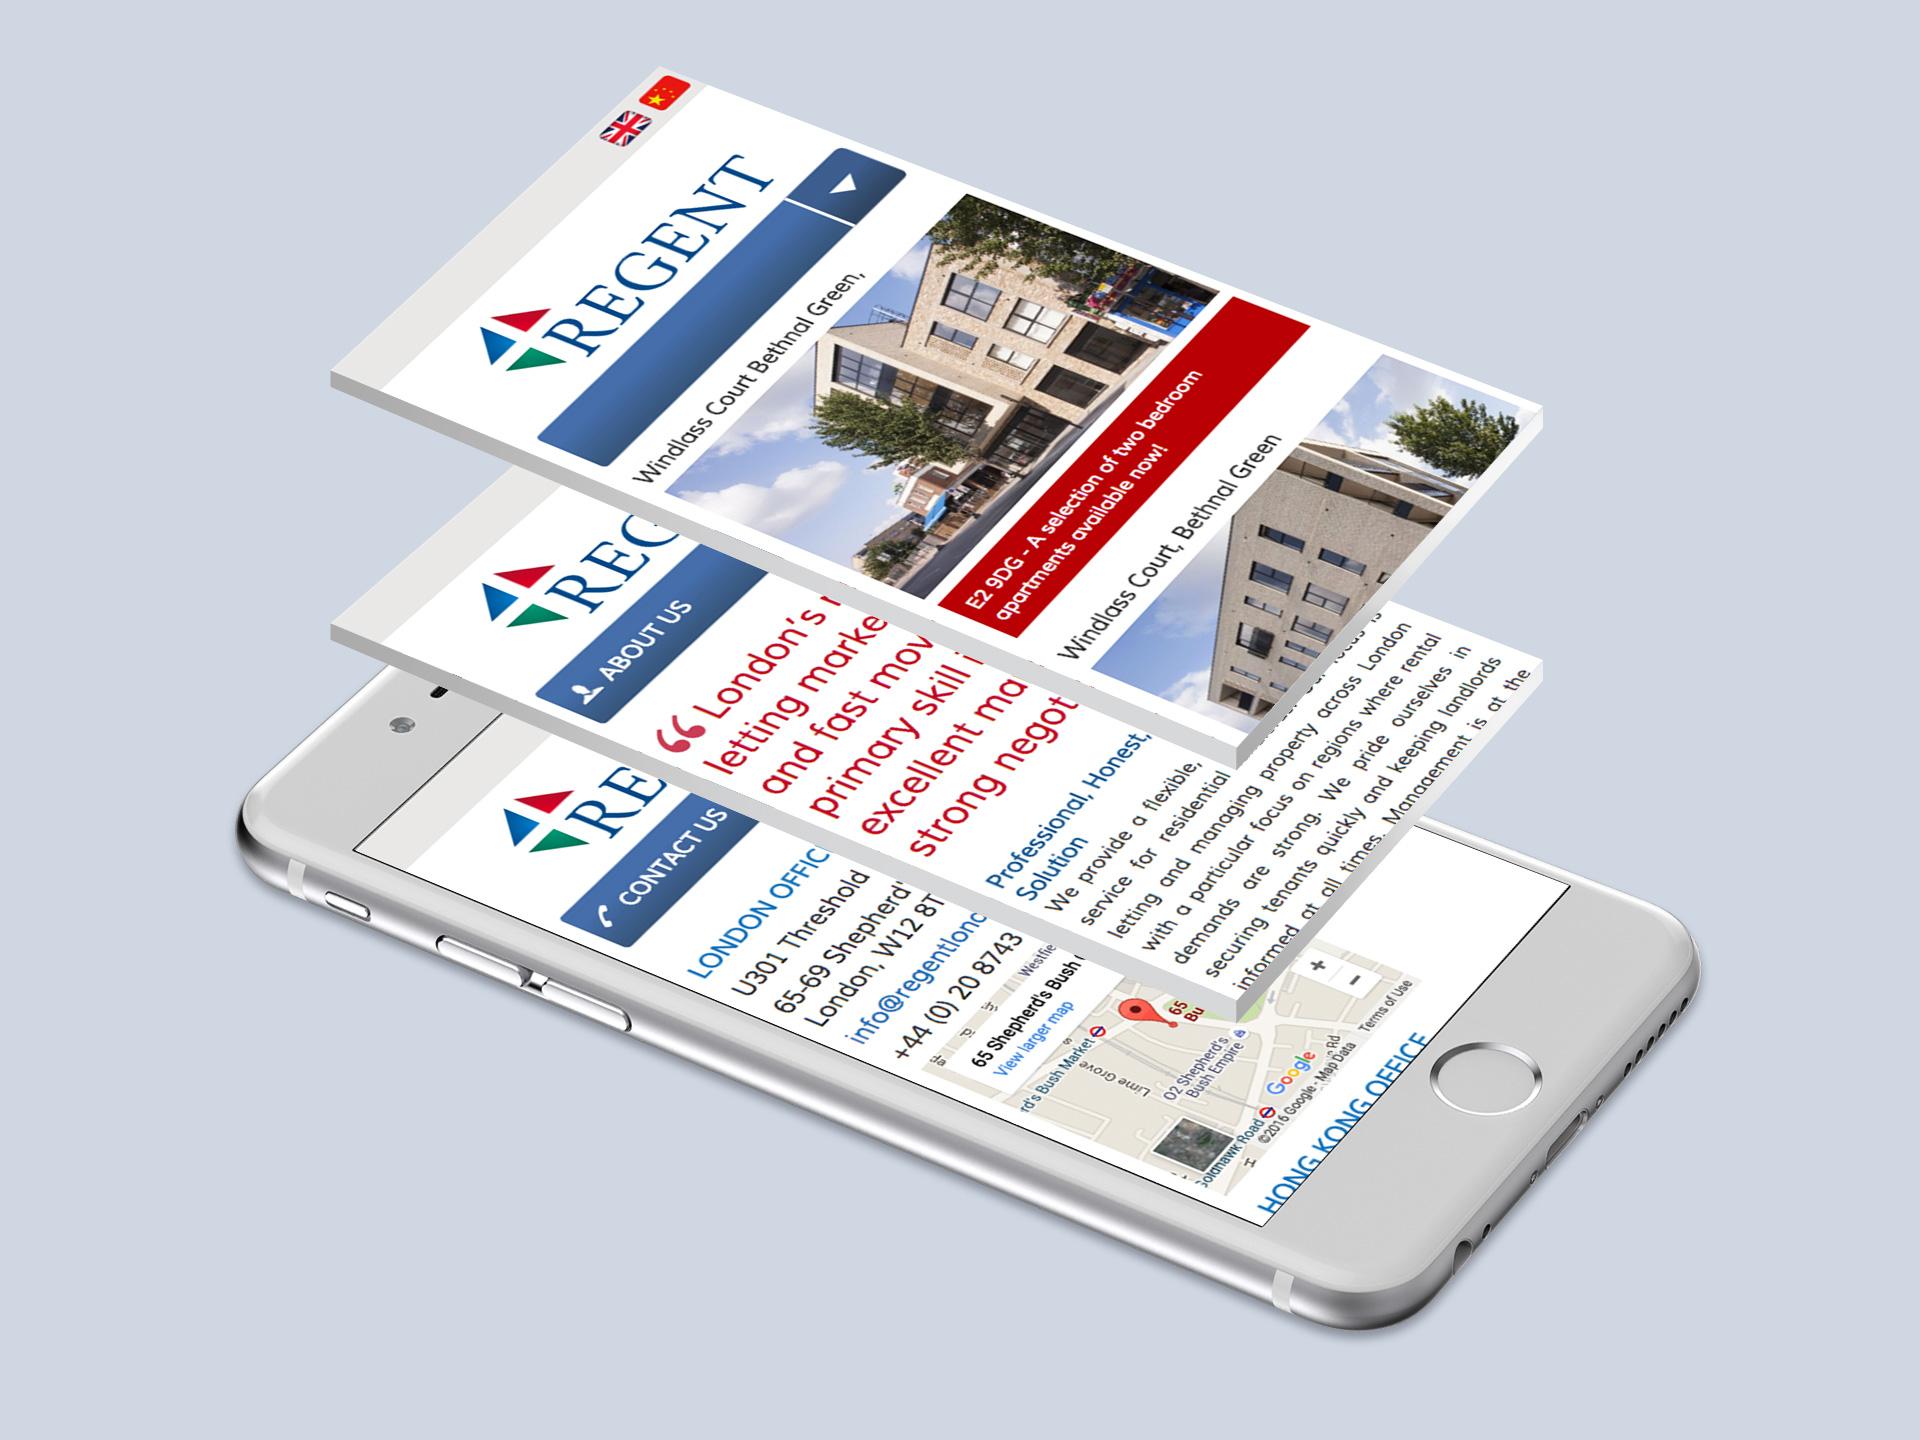 Regent Lettings Website <br>Design and Development